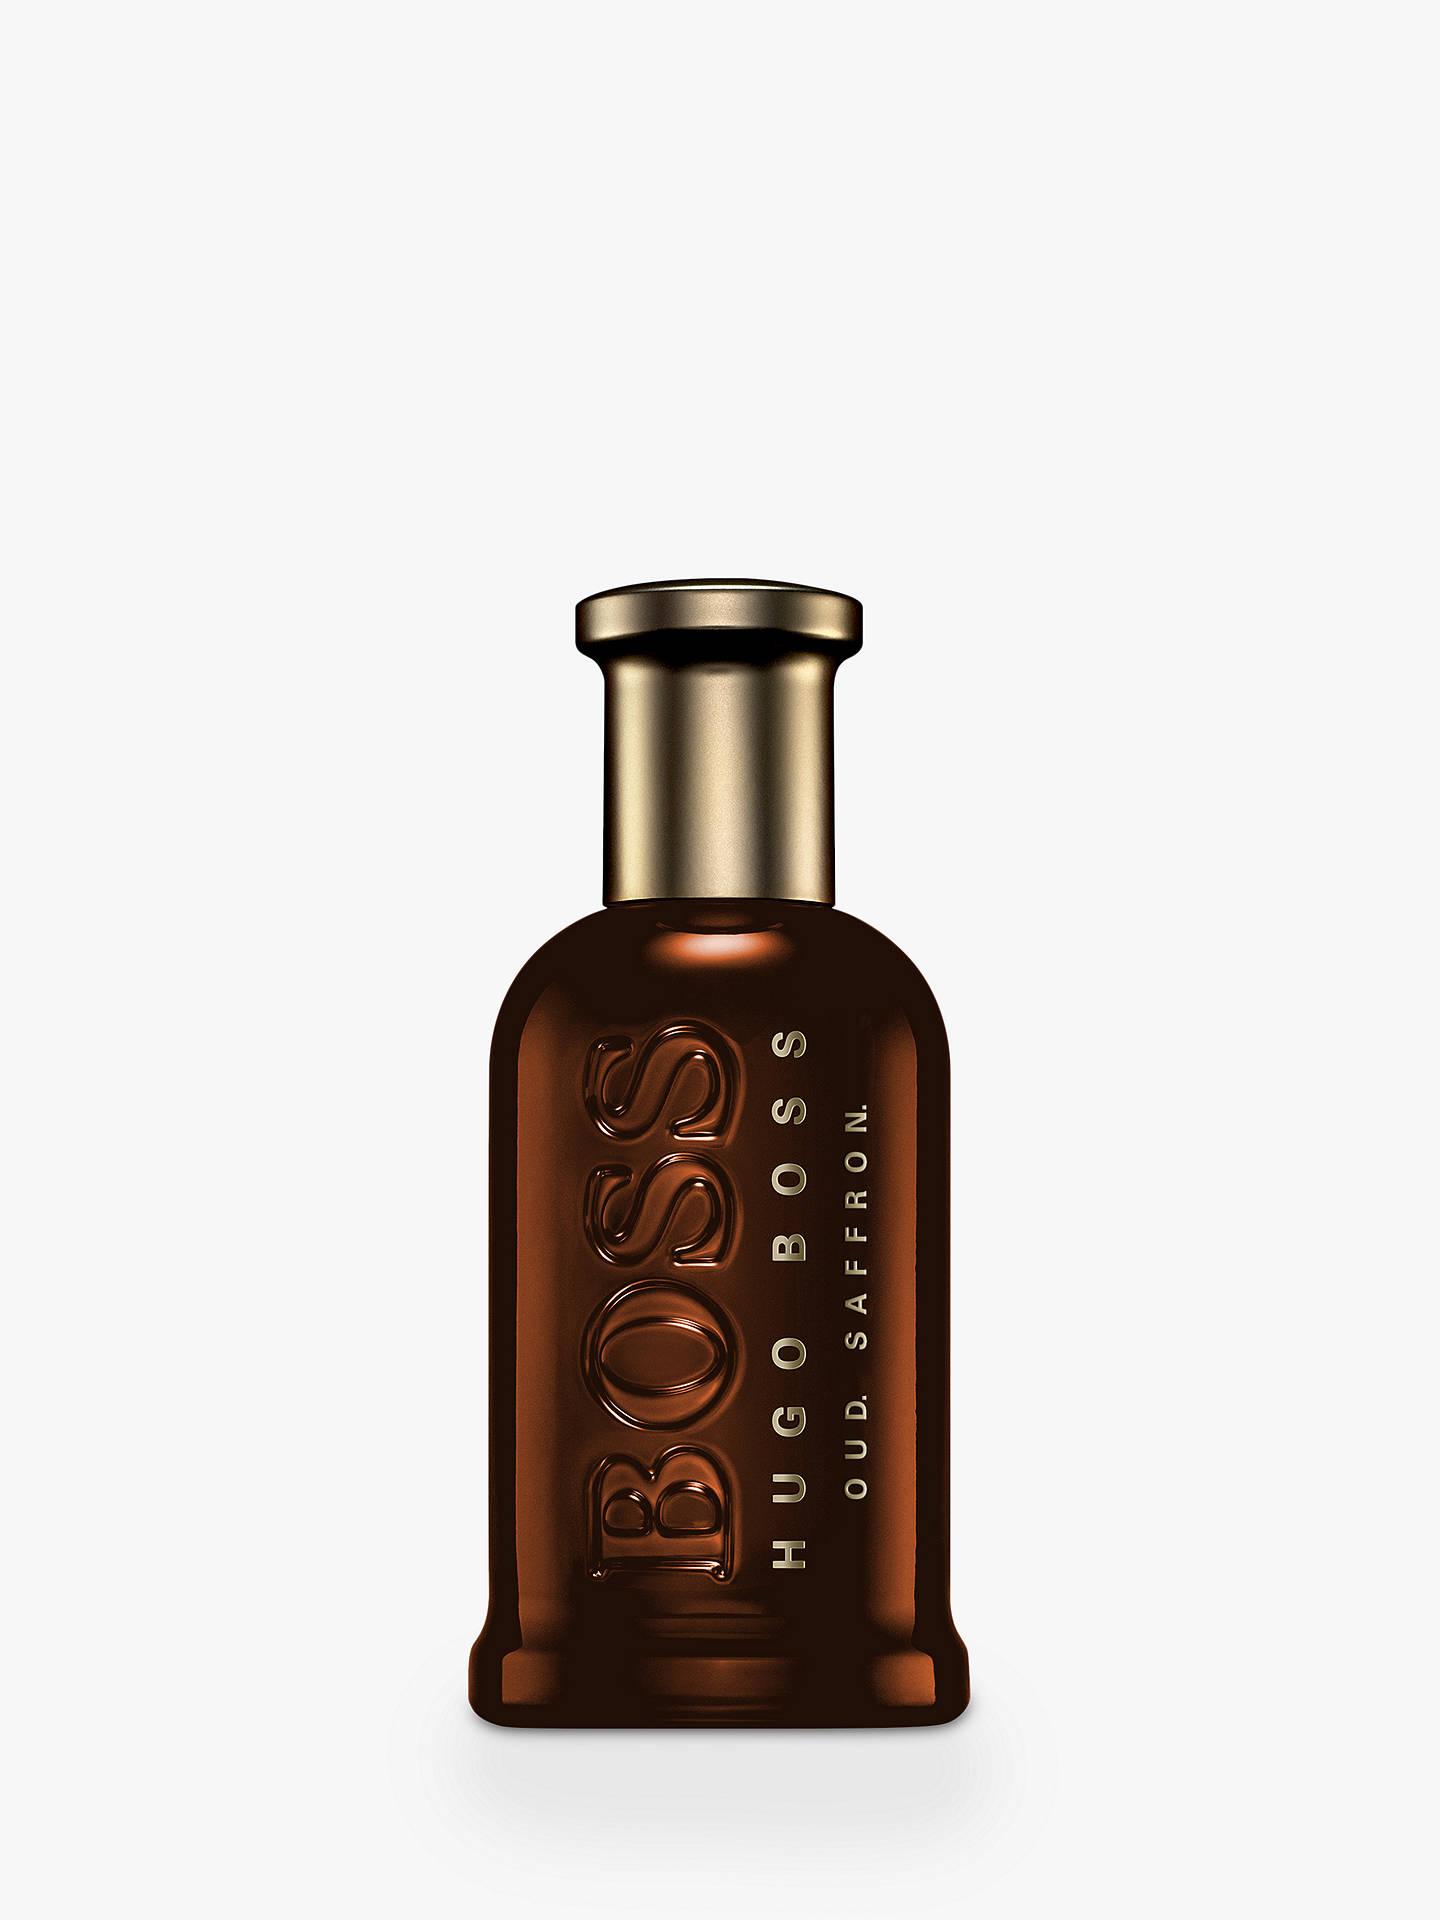 f33e39a9 Buy HUGO BOSS BOSS Oud Saffron Eau de Parfum, Limited Edition, 100ml Online  at ...